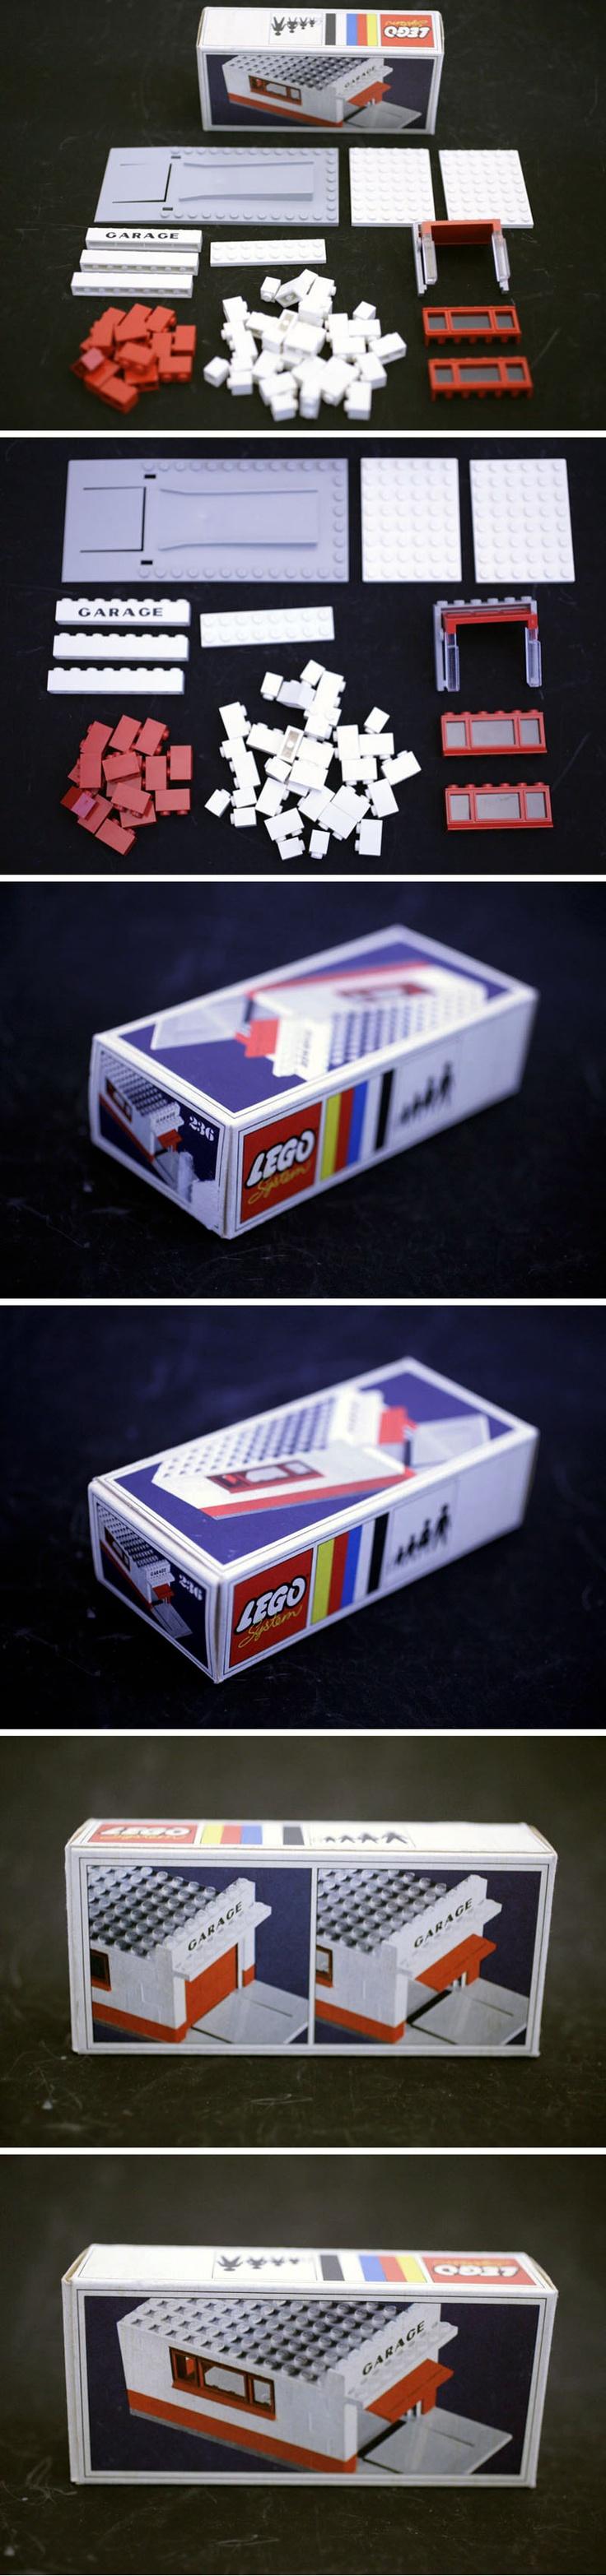 LEGO VINTAGE SET 236 GARAGE WITH DOOR FOR SALE ON EBAY.DE